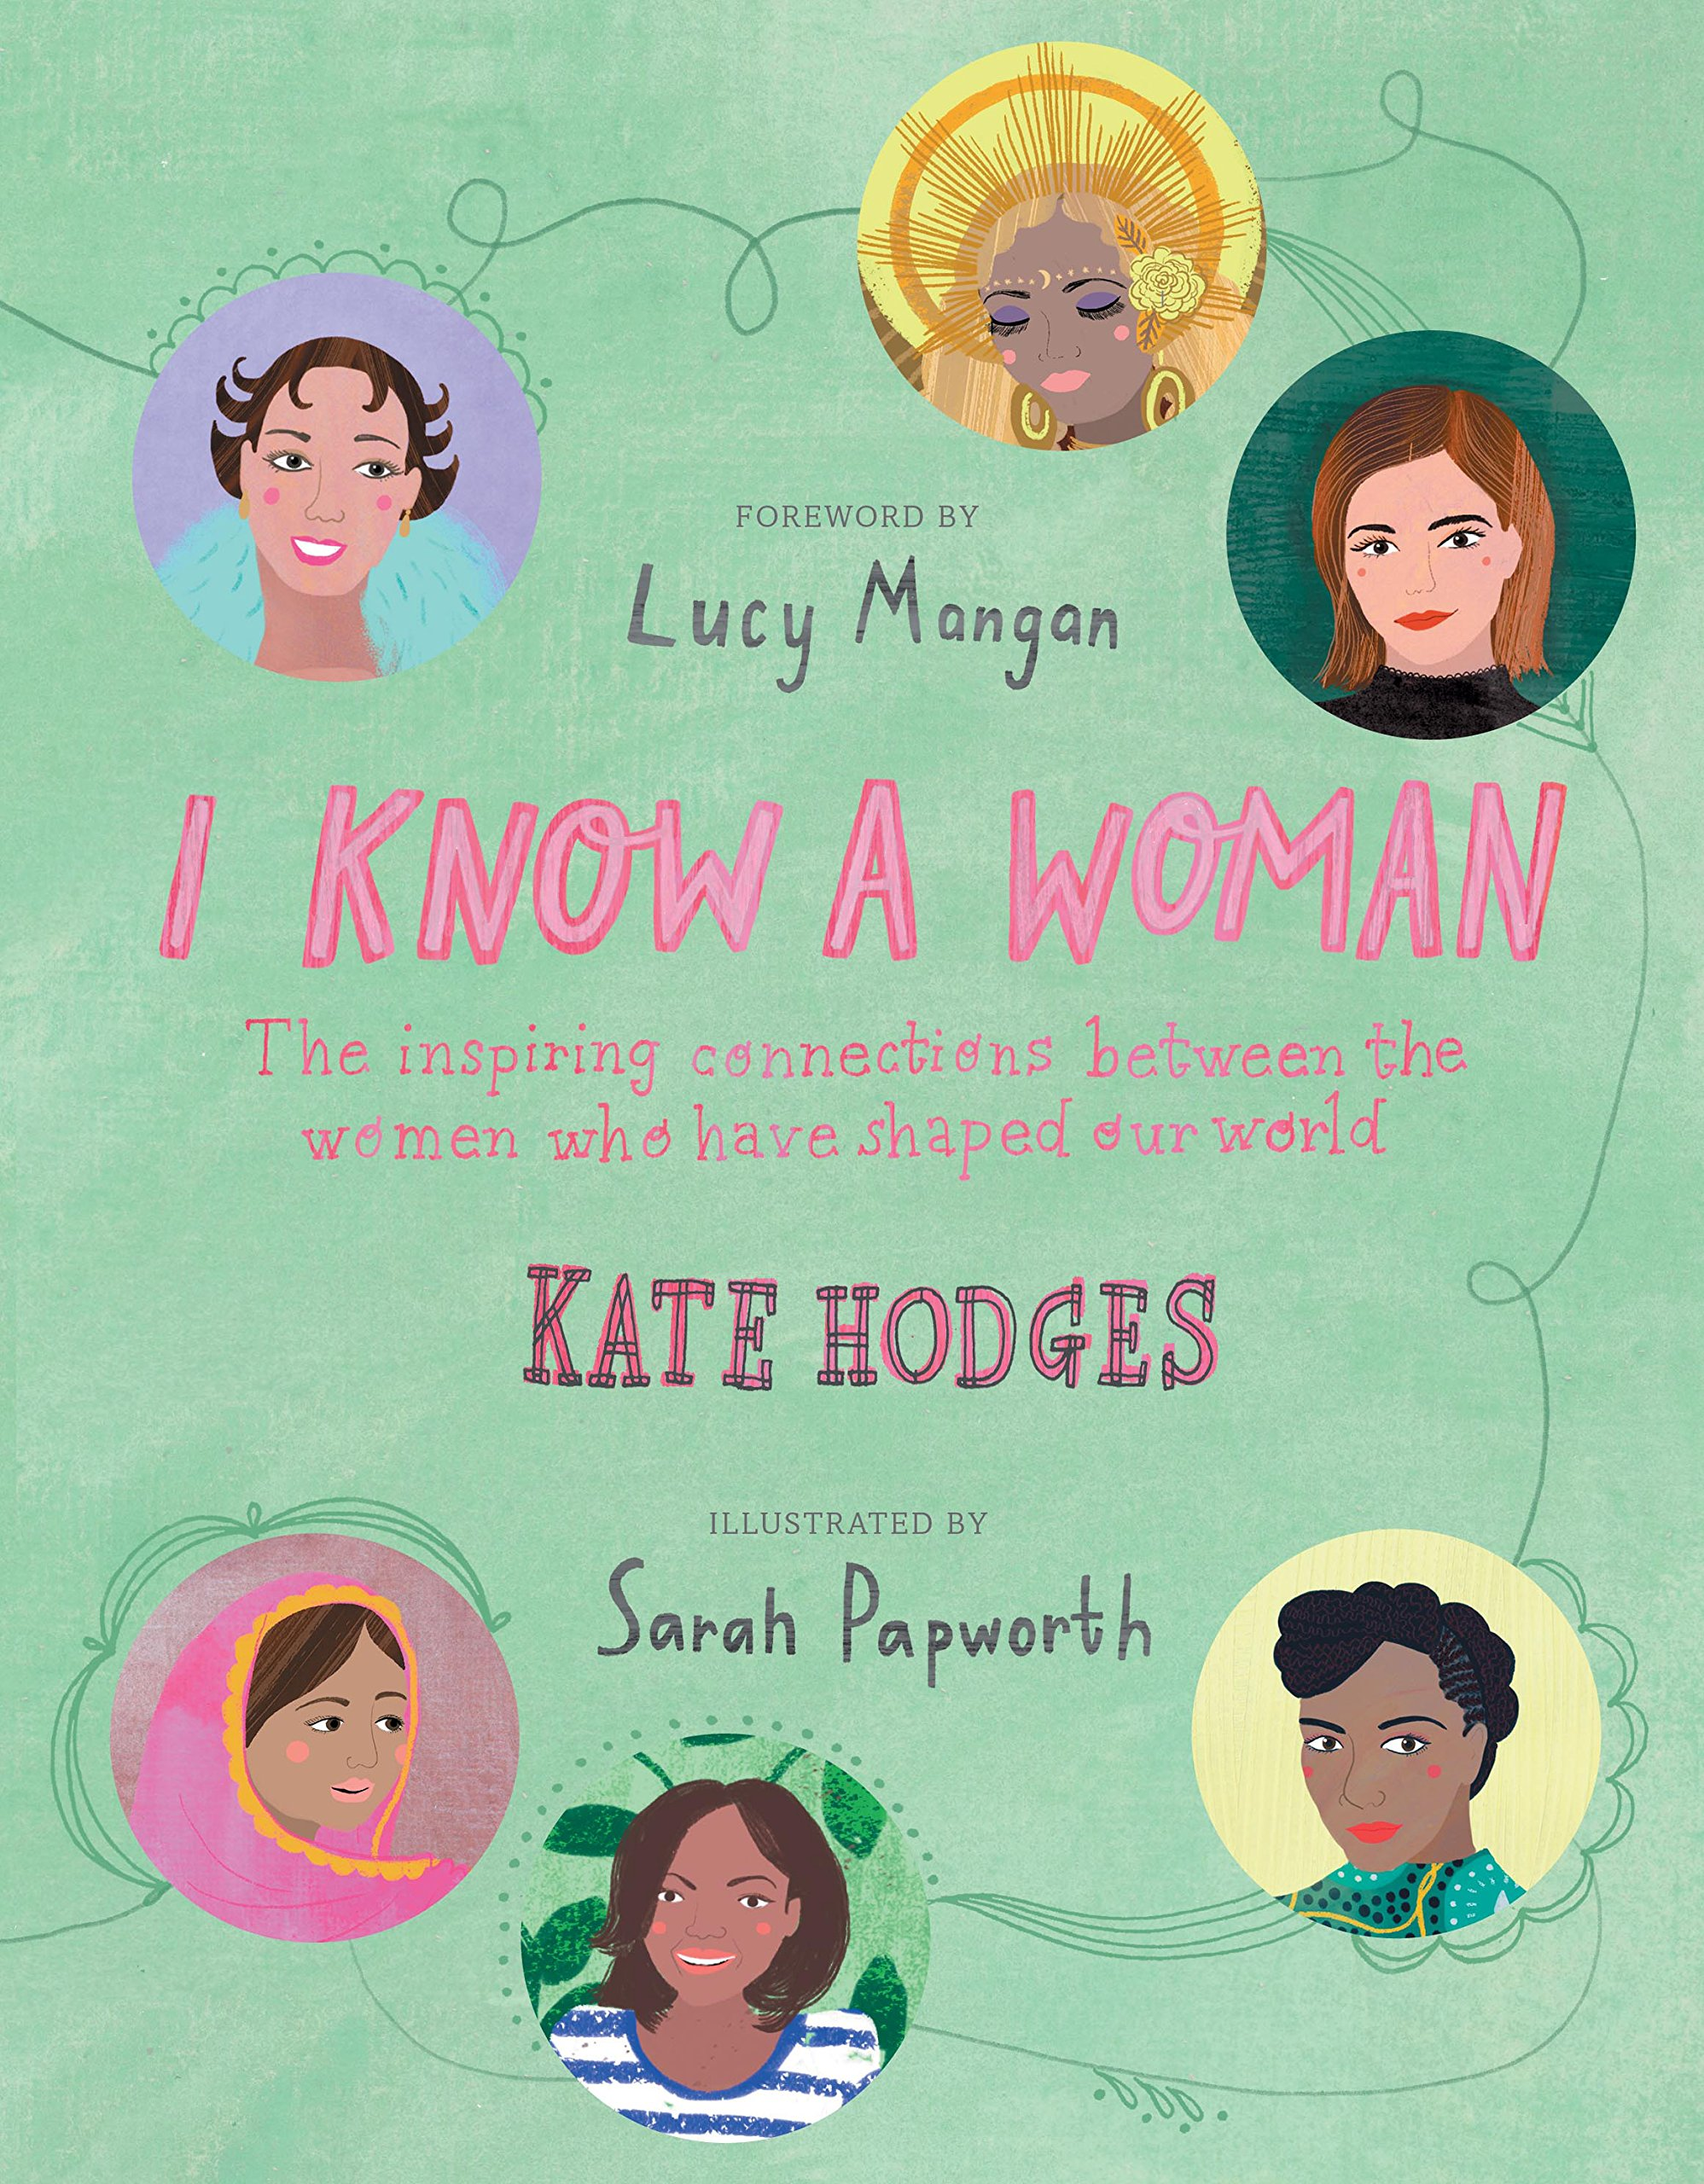 I know a woman libros inglés